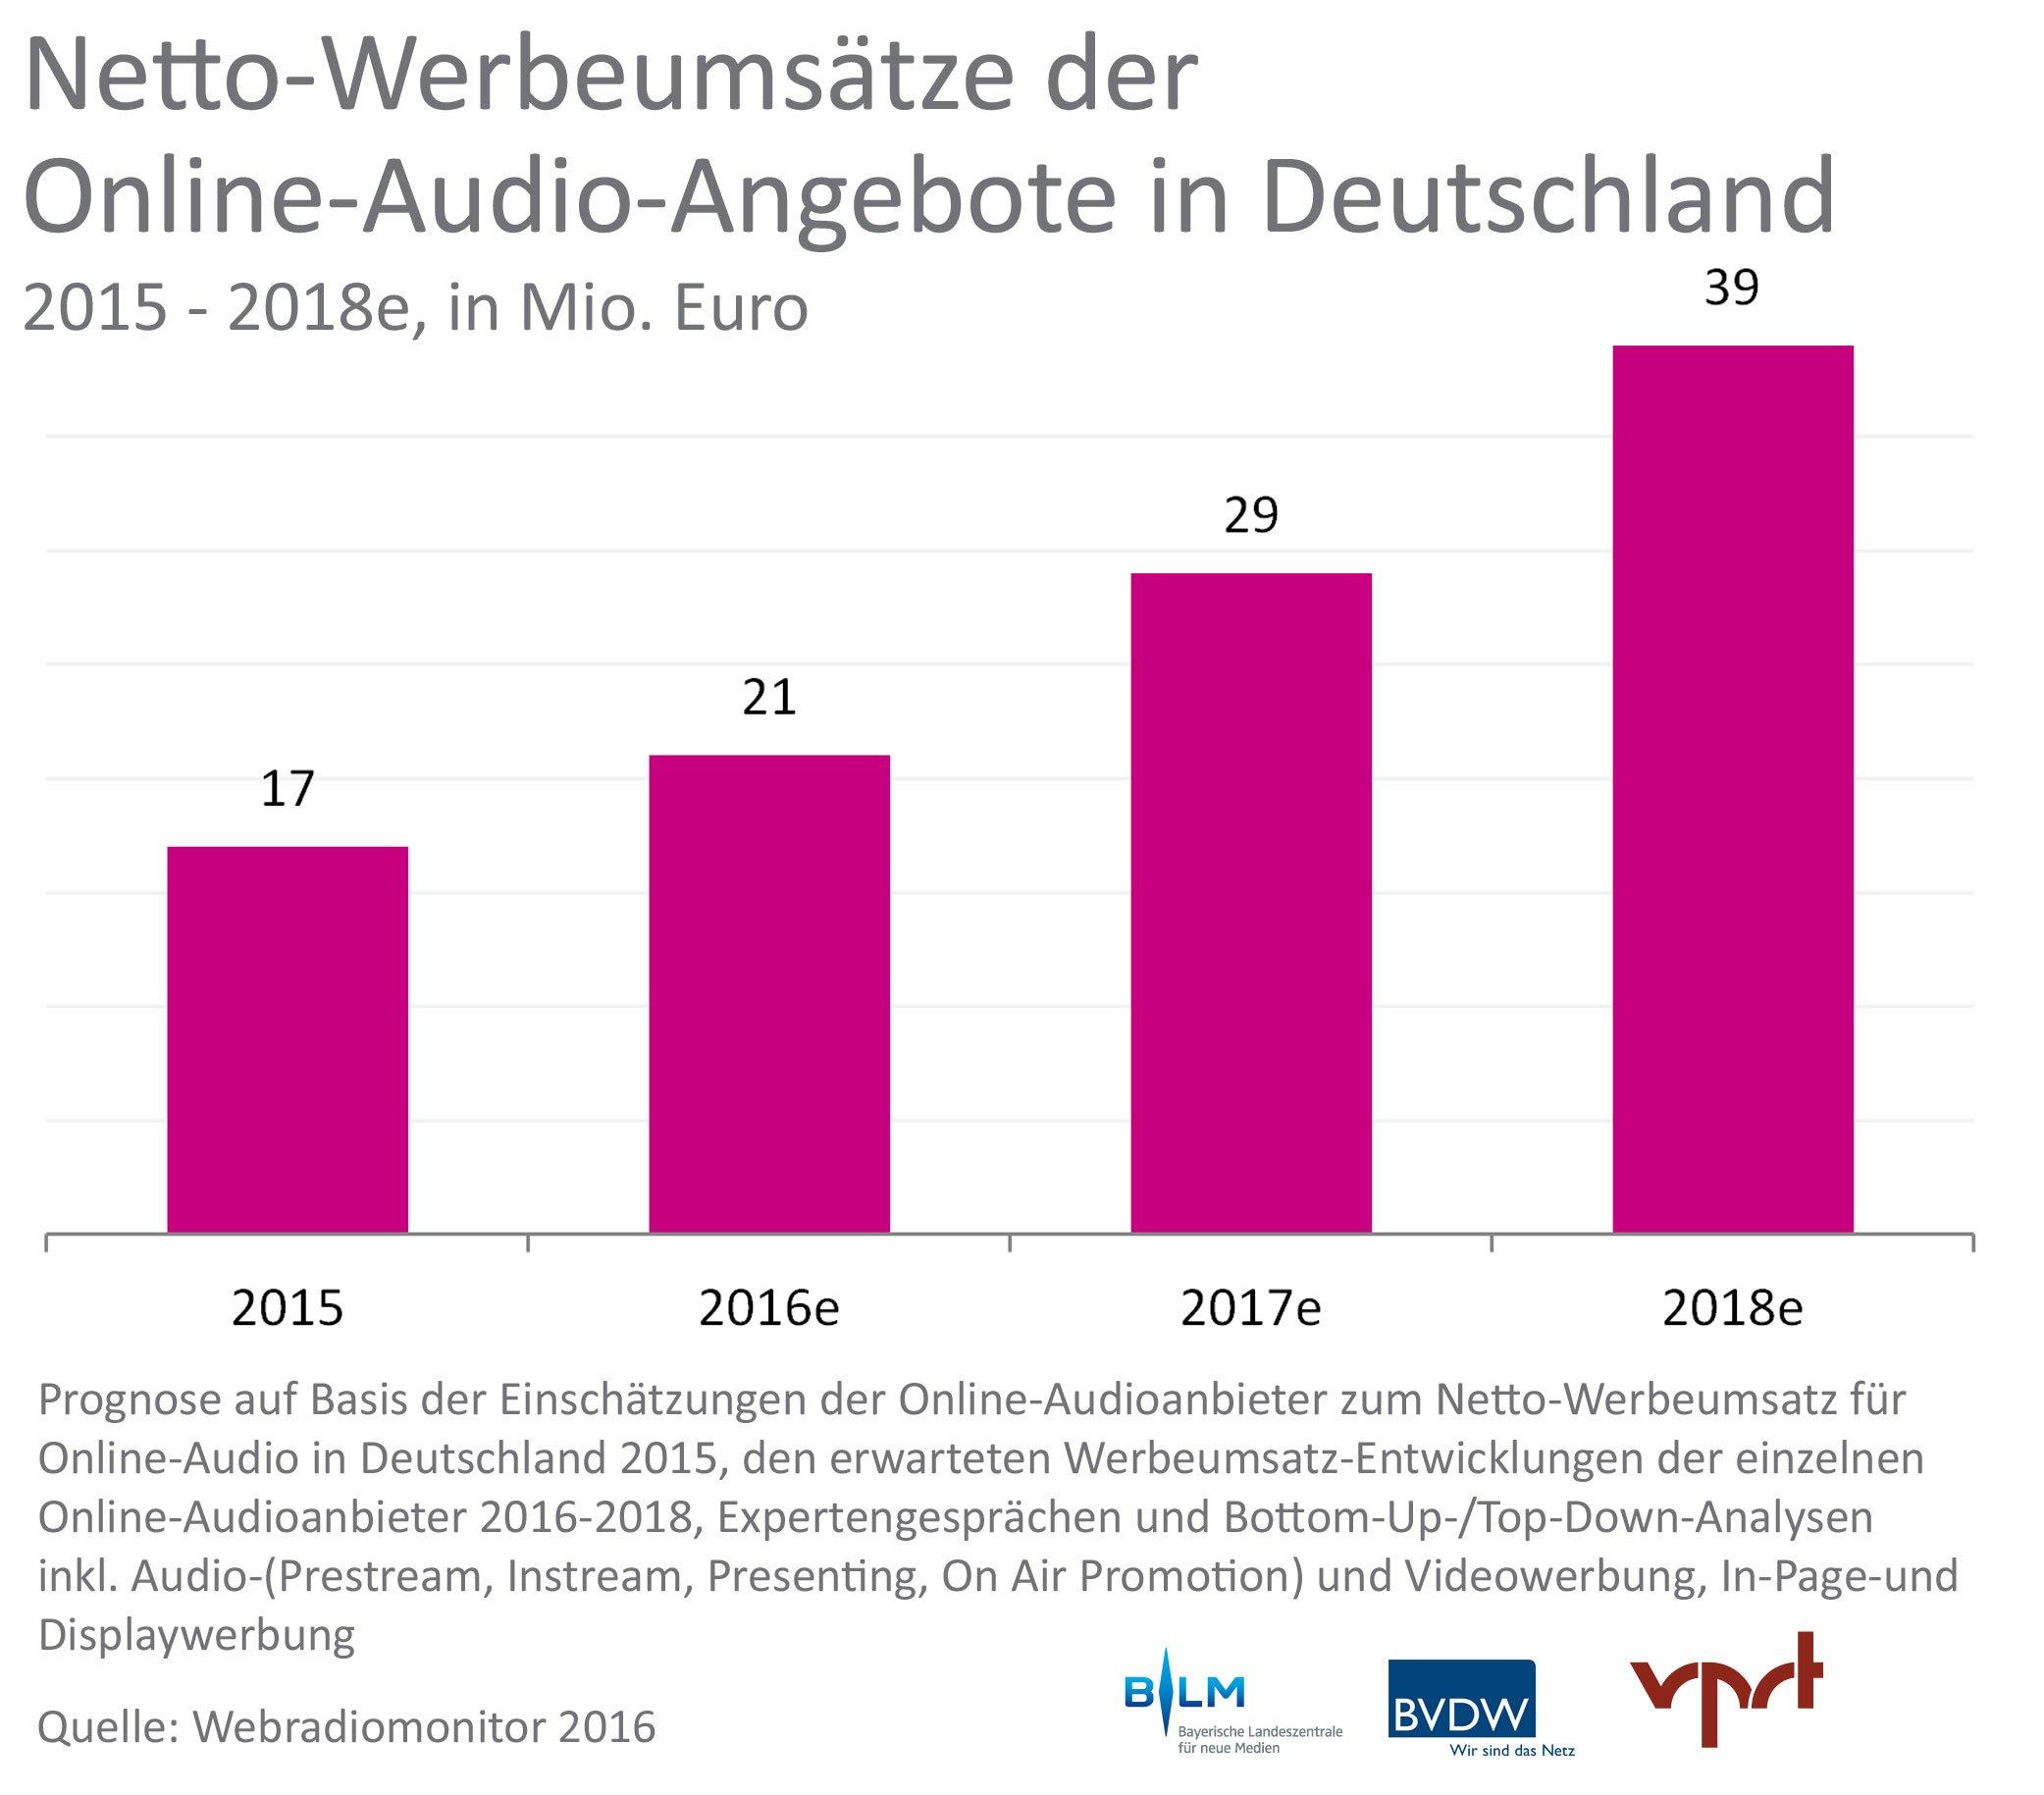 Webradiomonitor-2016: Netto-Werbeumsätze (Grafik: ©Webradiomonitor)